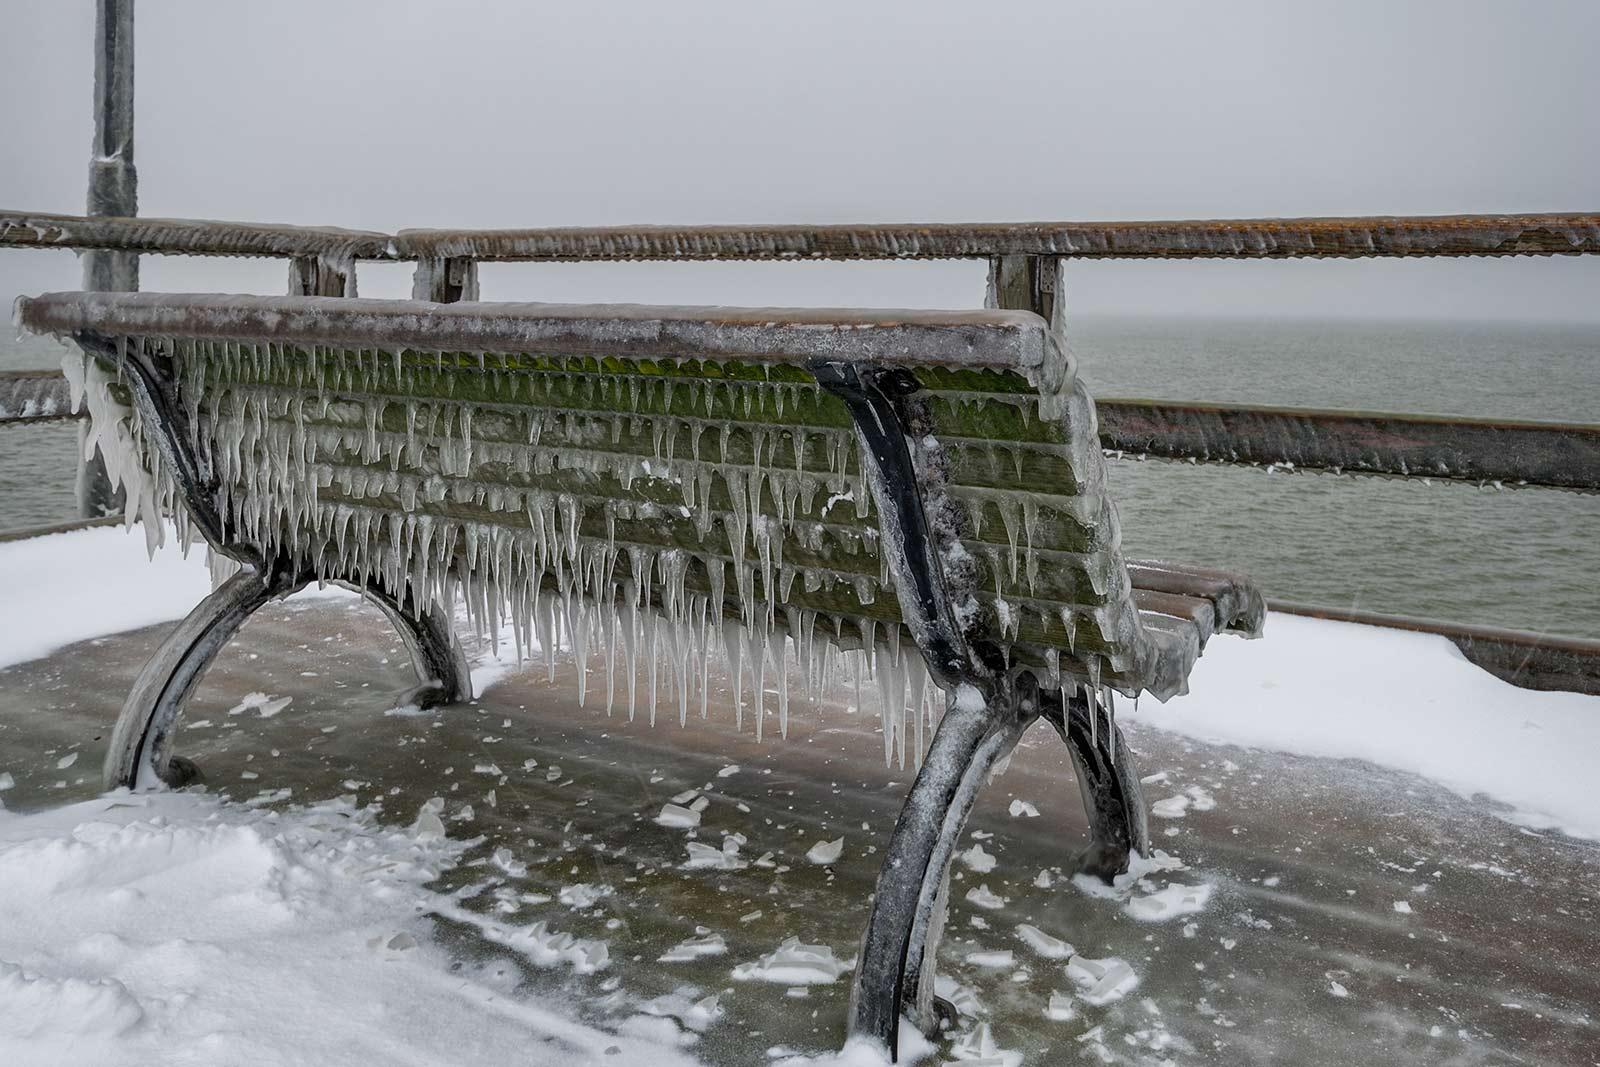 Winter an der Bansiner Seebrücke